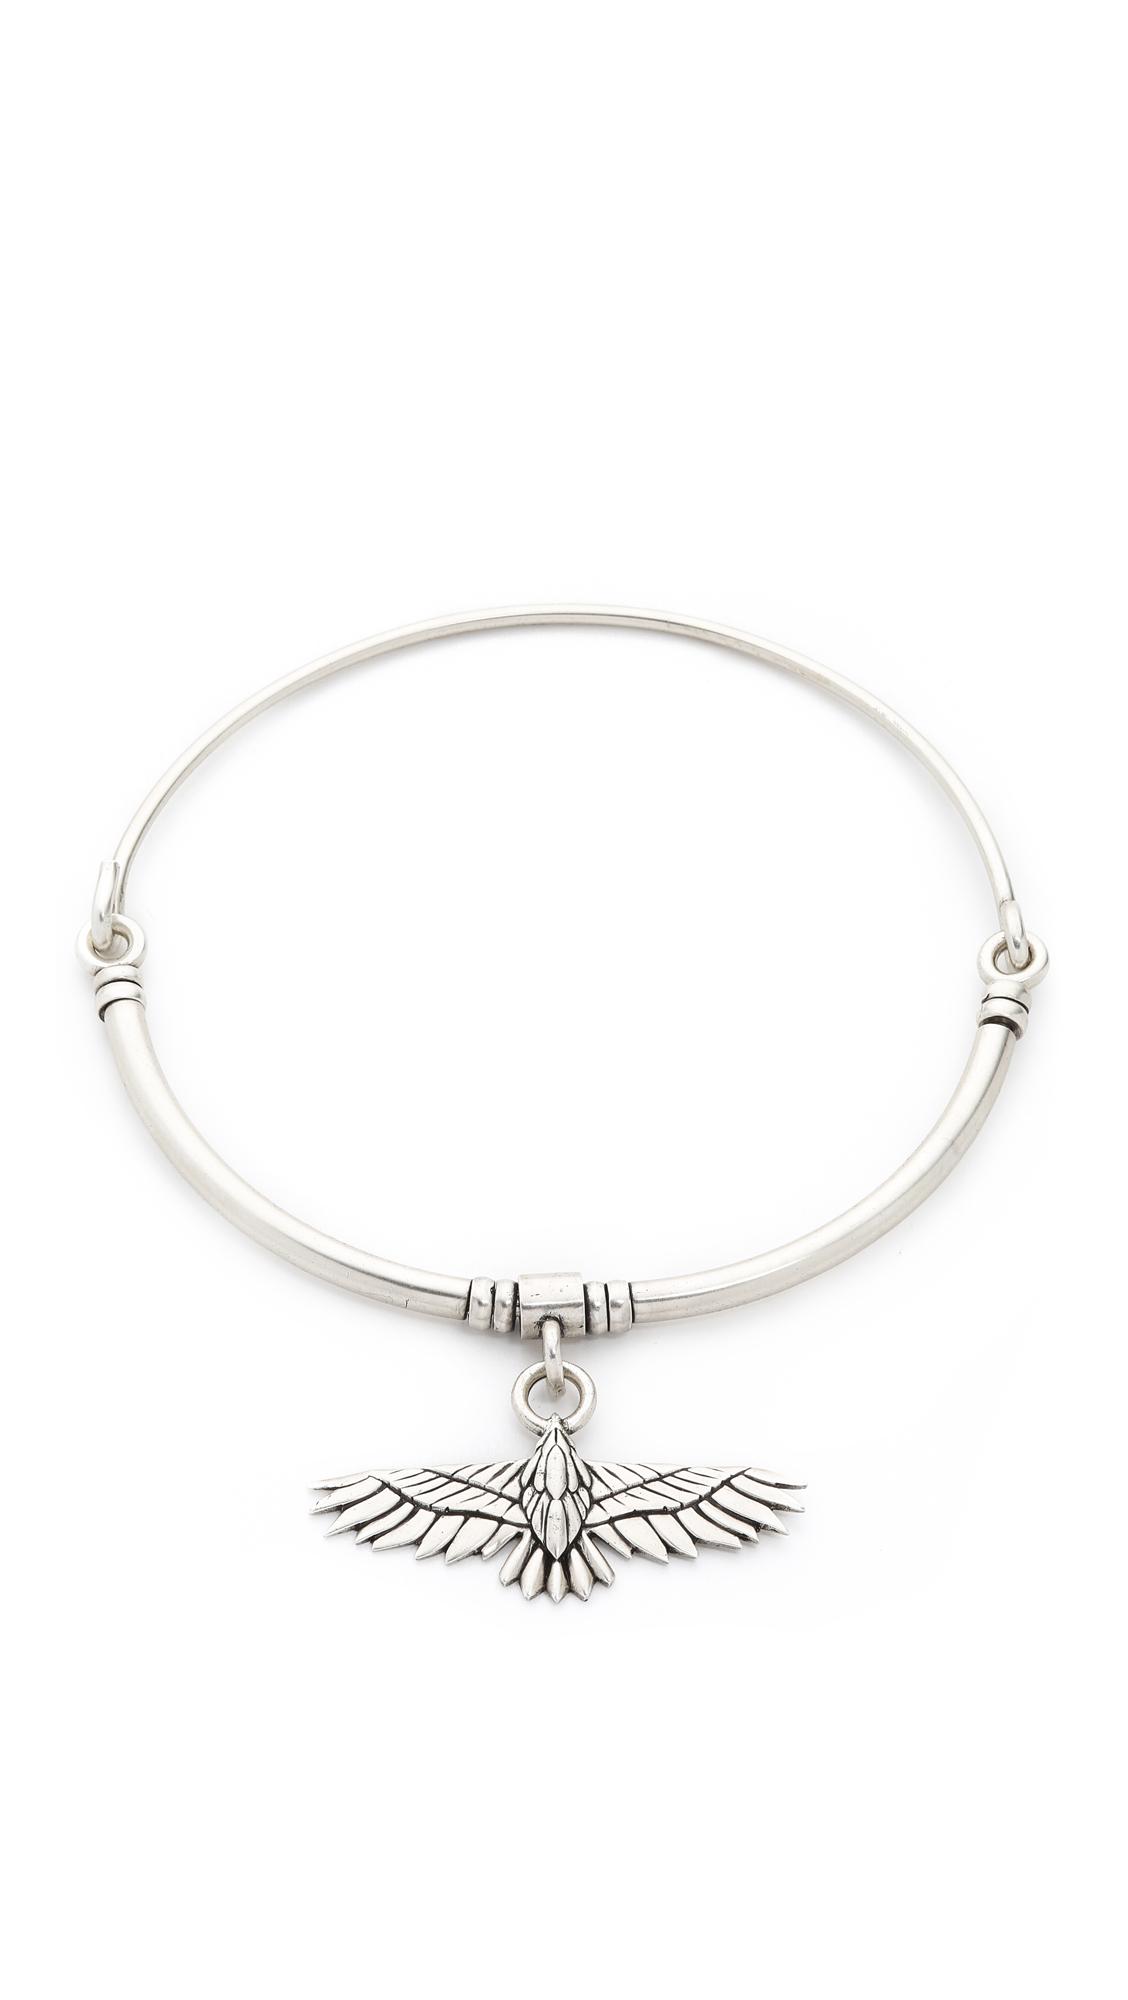 Pamela Love Womens Neptune Collar Necklace JLlJh9wEd